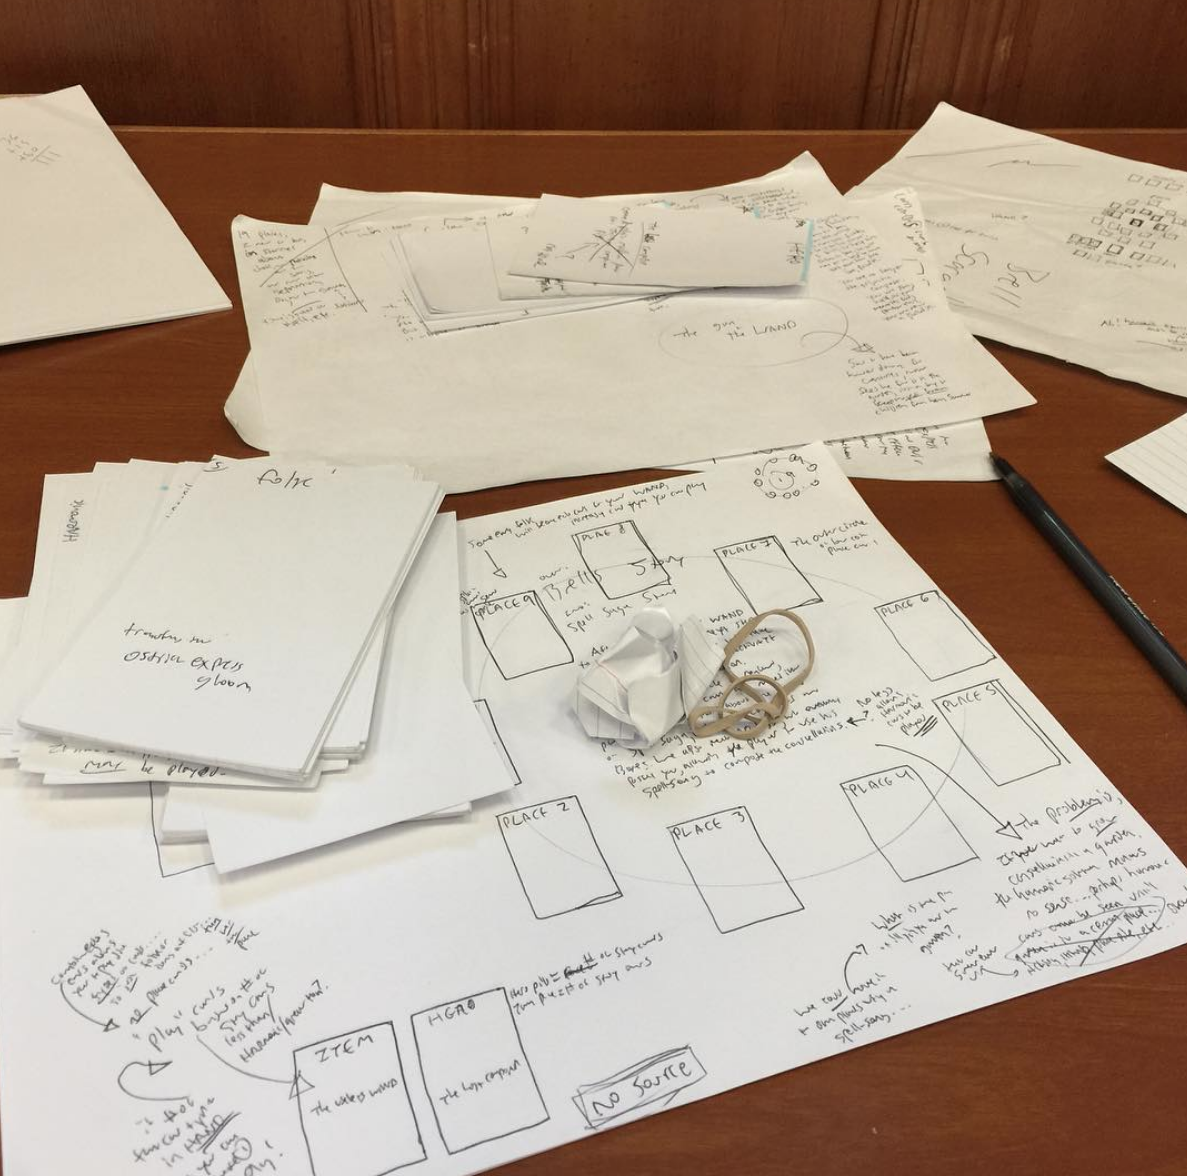 2016 rwTDS Game Design notes October 20th